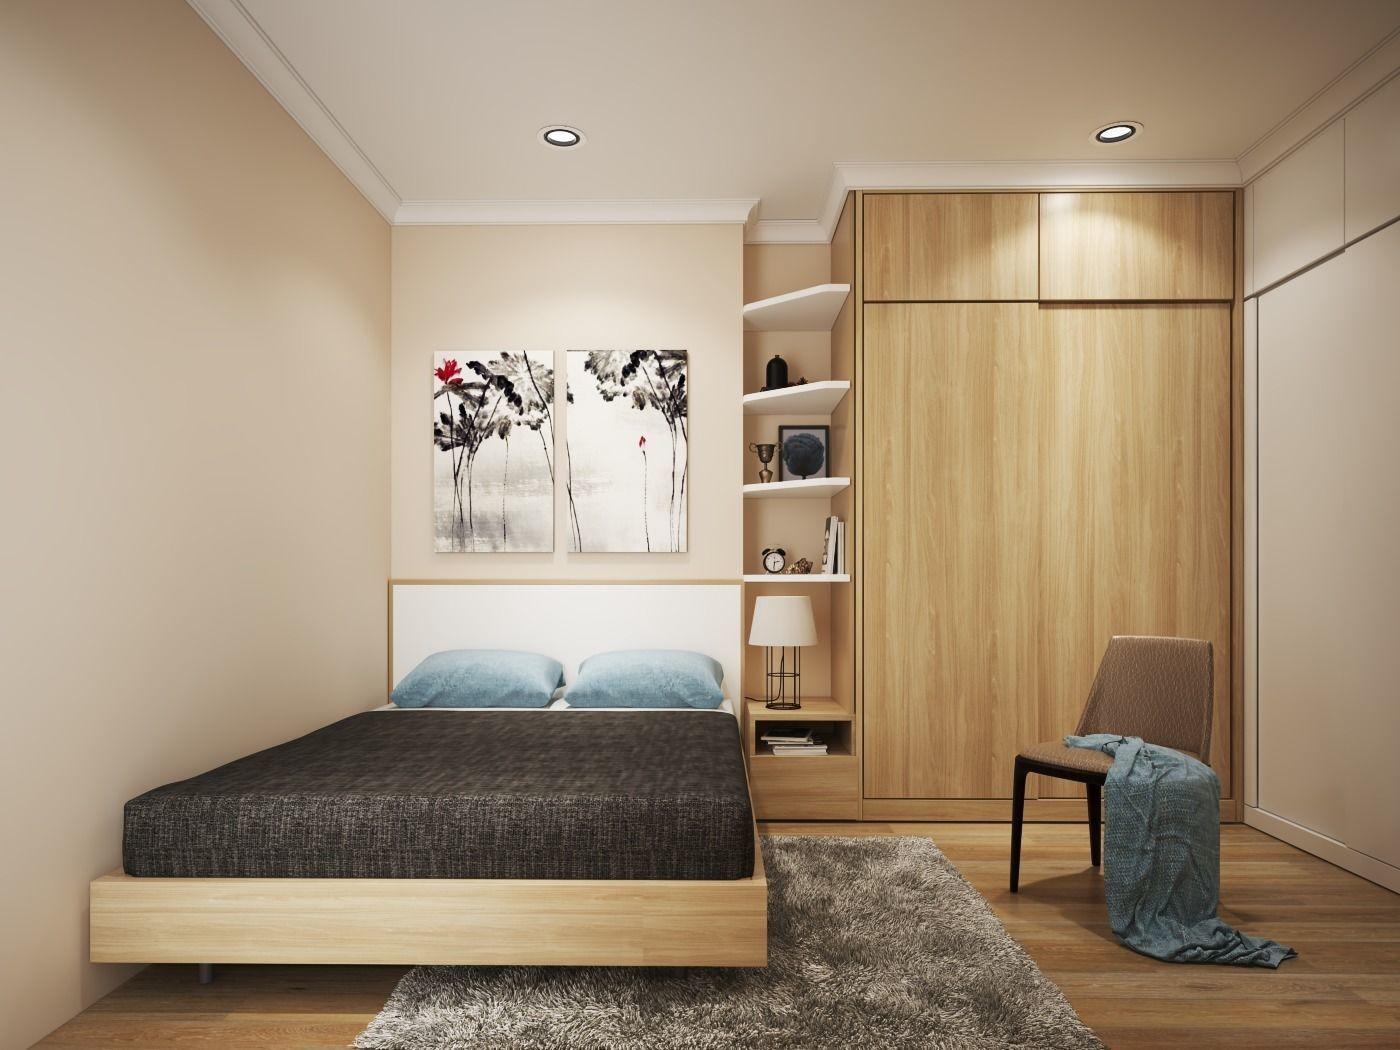 Simple Bedroom Model Interior Design V 3d Max 3ds Fbx Simple Bedroom Interior Design Model Homes